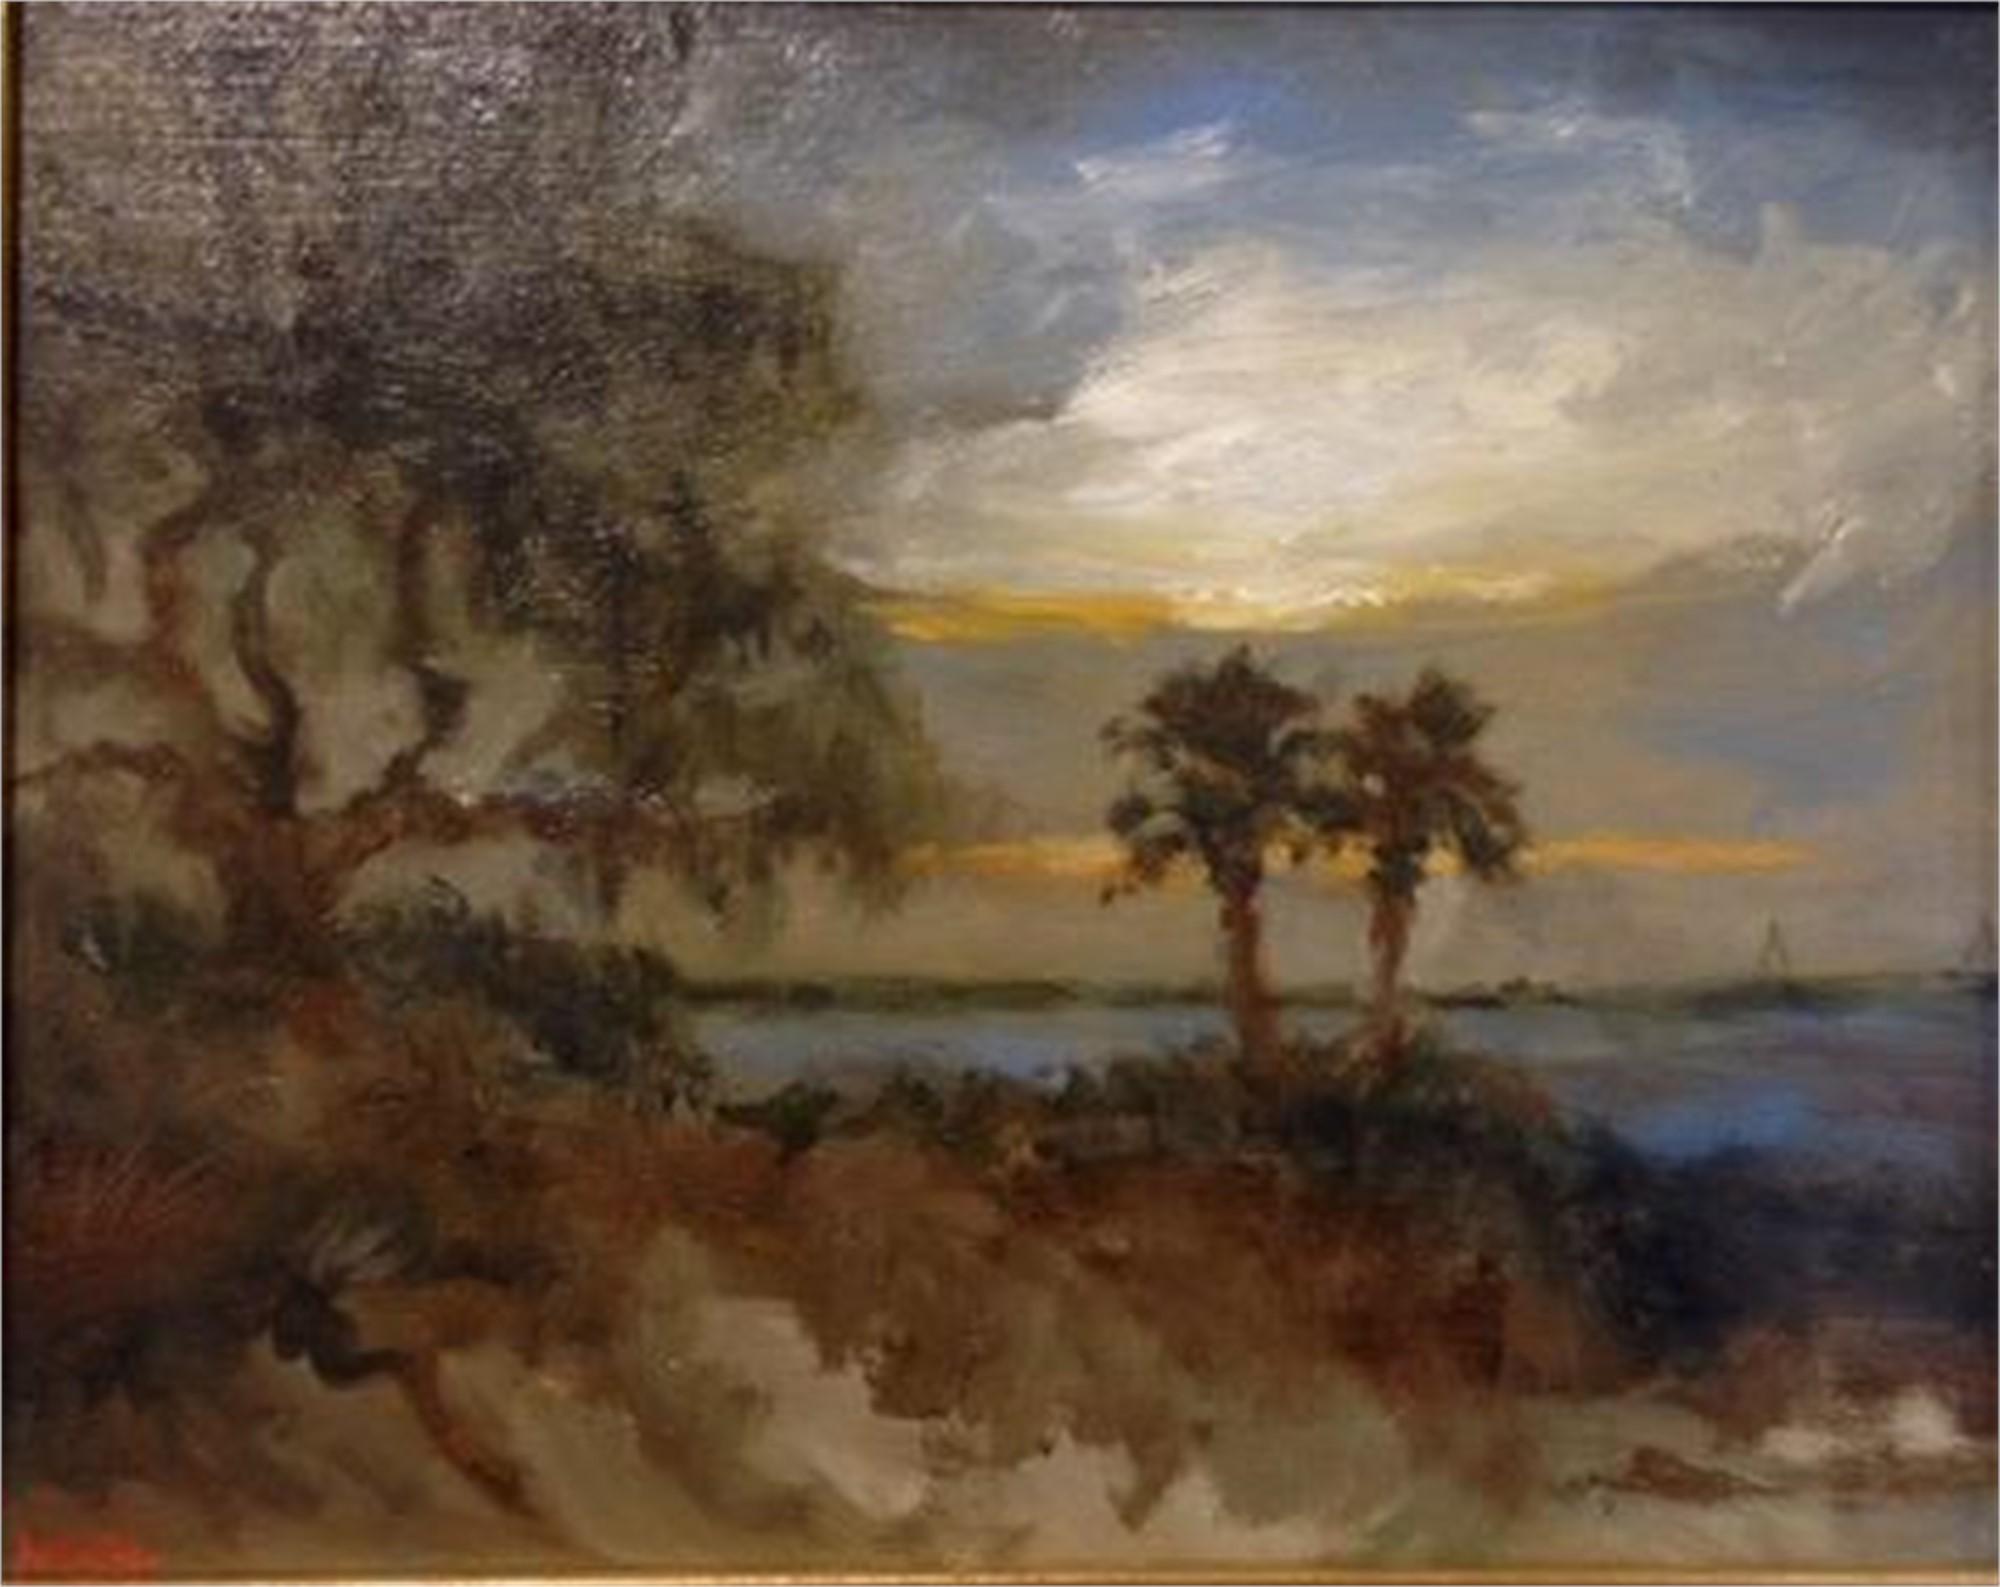 Oak on the Harbor by Jim Darlington